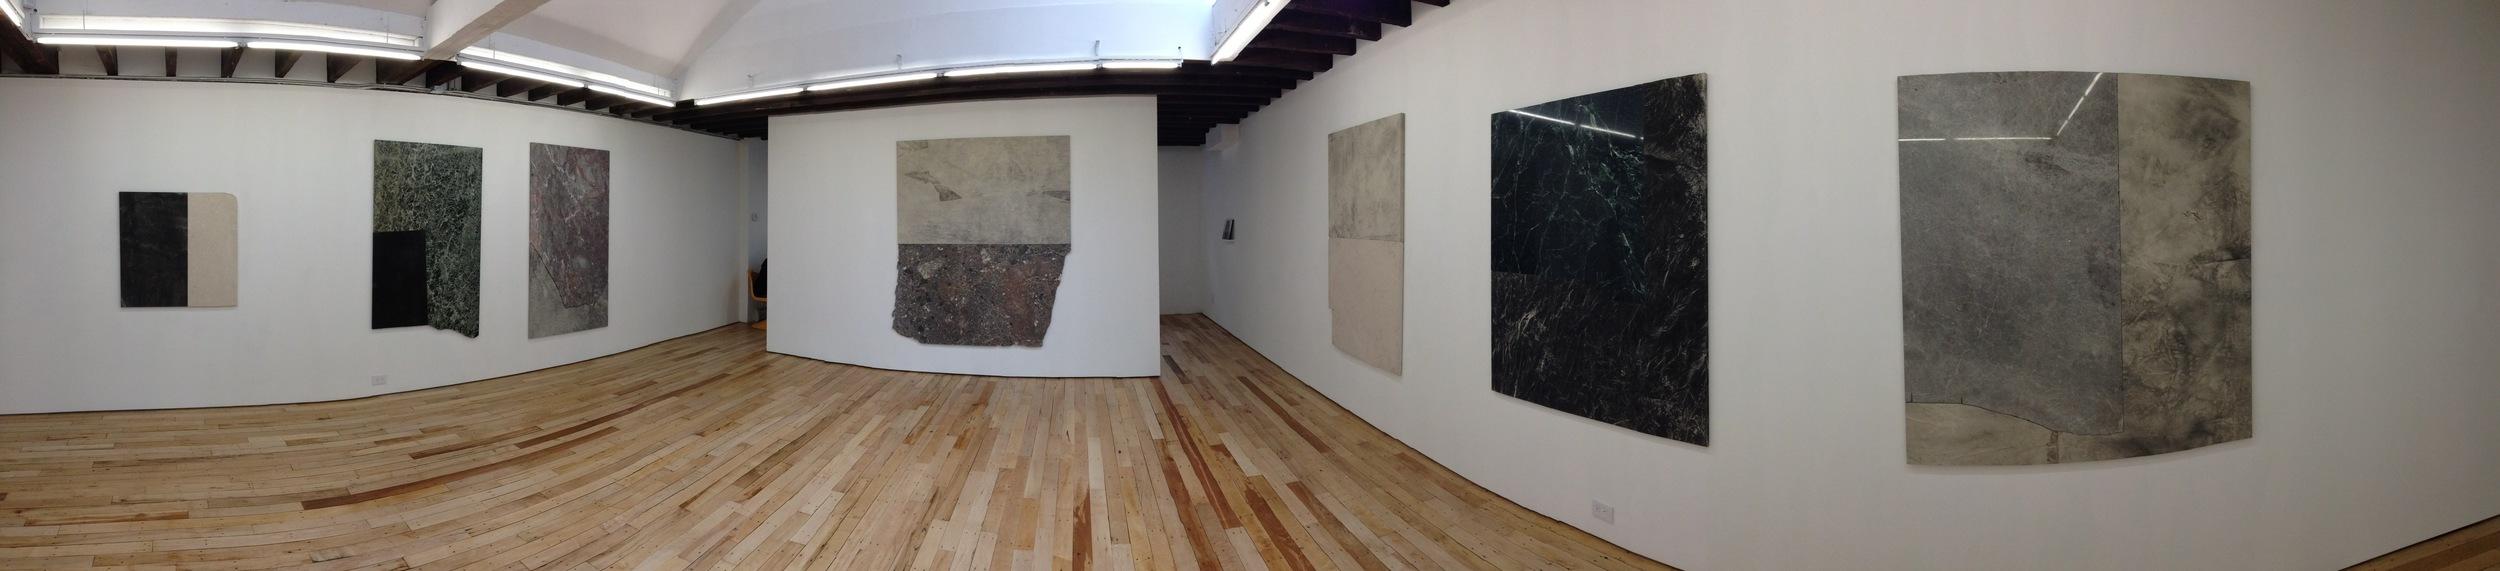 Exhibition Image, More Weight, Sam Moyer at Rachel Uffner Gallery, Lower East Side Photo Credit: Cincala Art Advisory